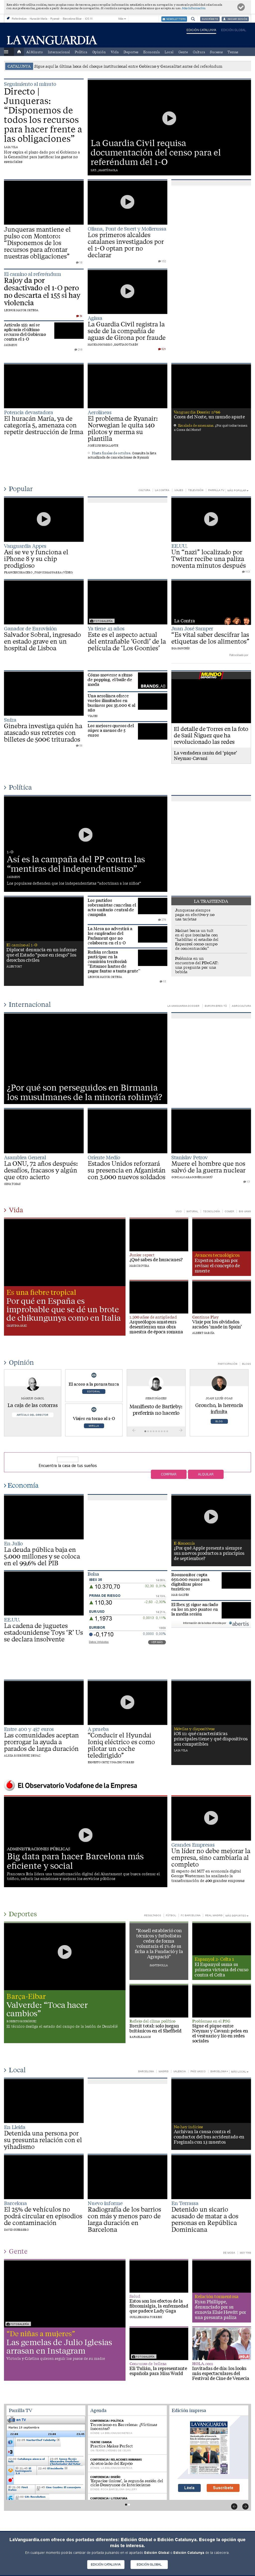 La Vanguardia at Tuesday Sept. 19, 2017, 12:24 p.m. UTC